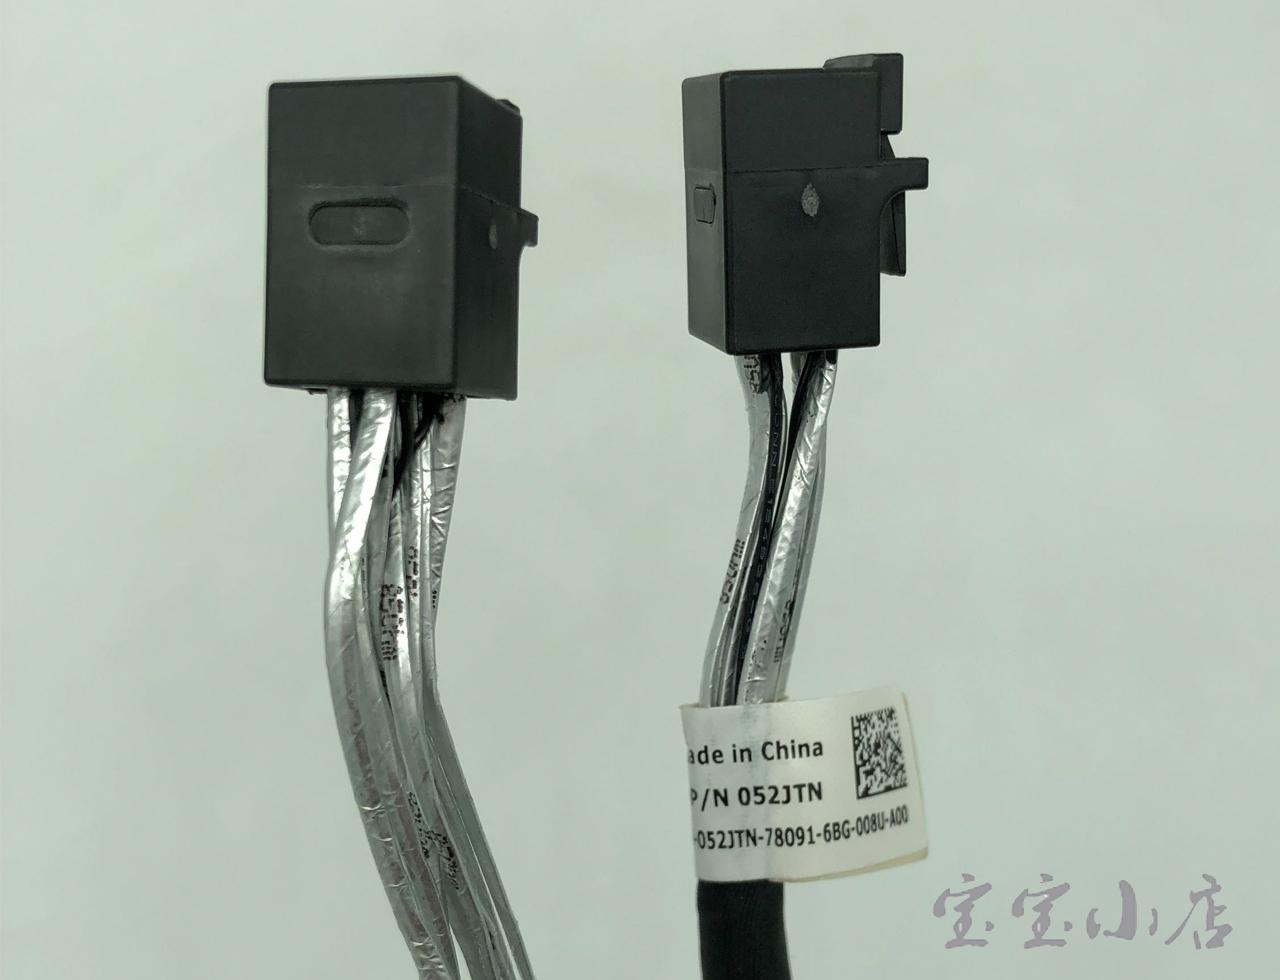 D P/N 052JTN 全新戴尔 DELL 双通道 SFF-8643 转 SFF-8639 NVMe SSD U.2固态硬盘数据线 12pin供电